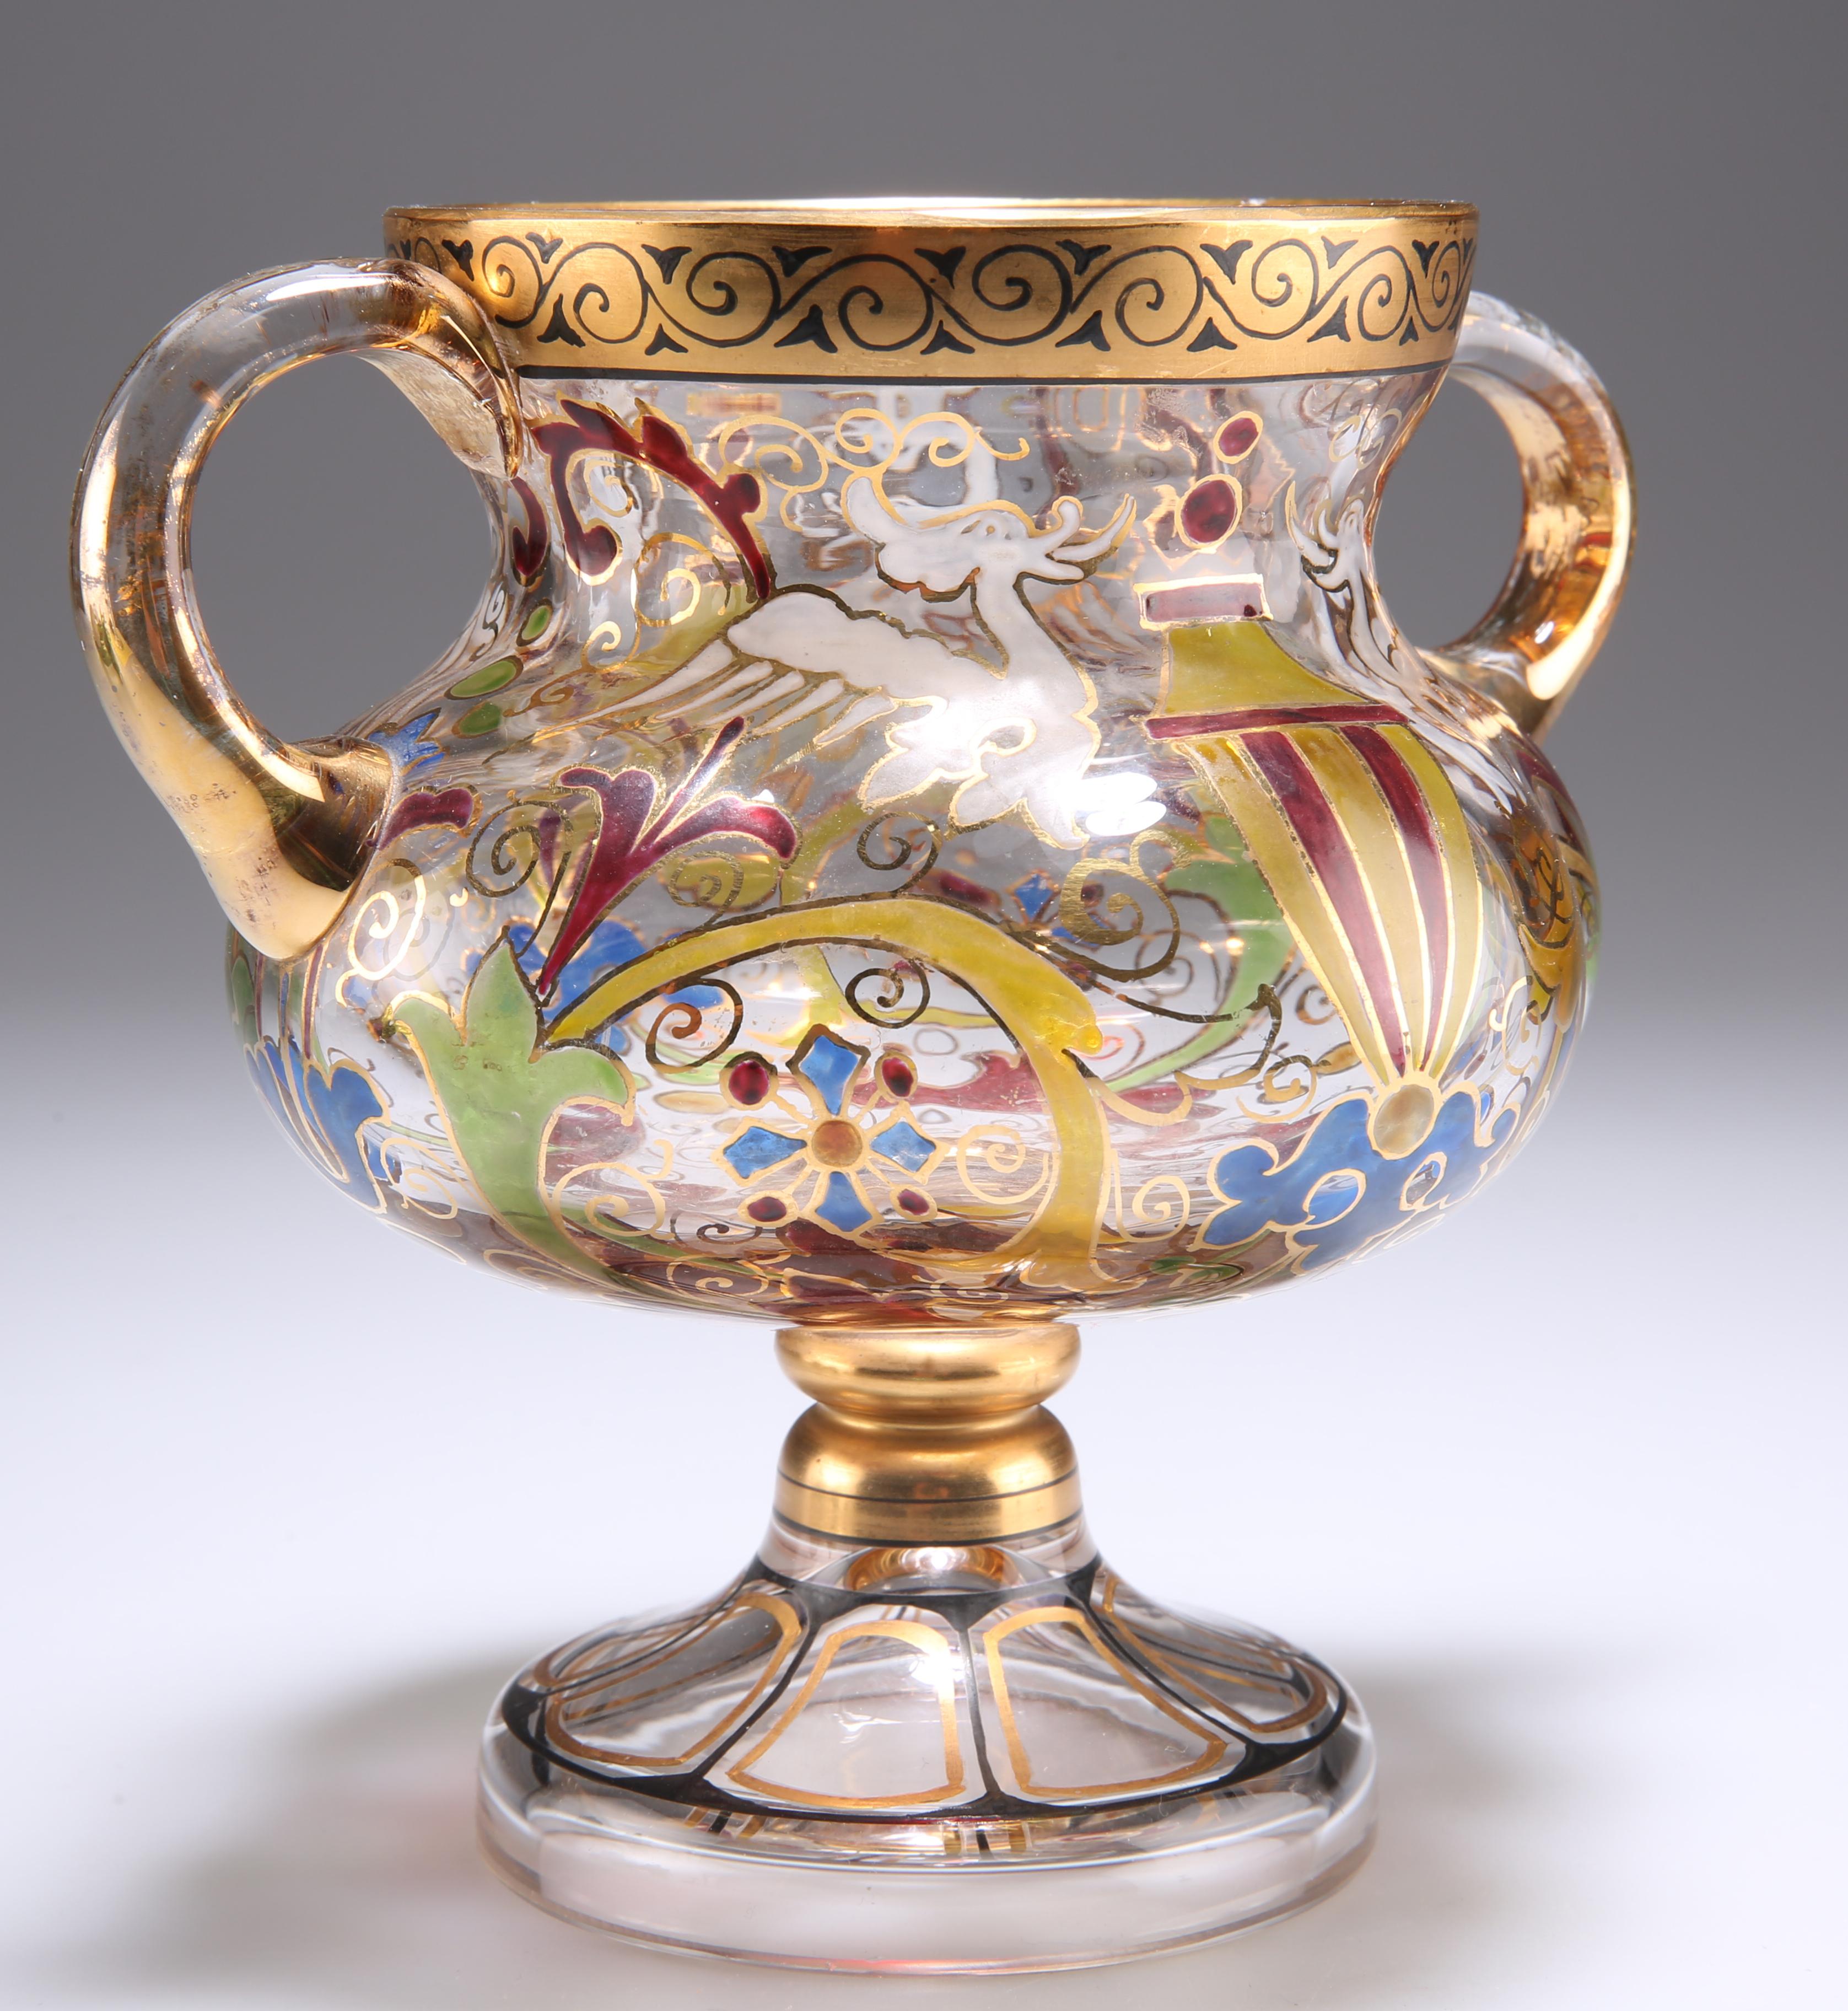 A BOHEMIAN STEINSCHONAU ART NOUVEAU TWO-HANDLED GLASS CUP - Image 3 of 6